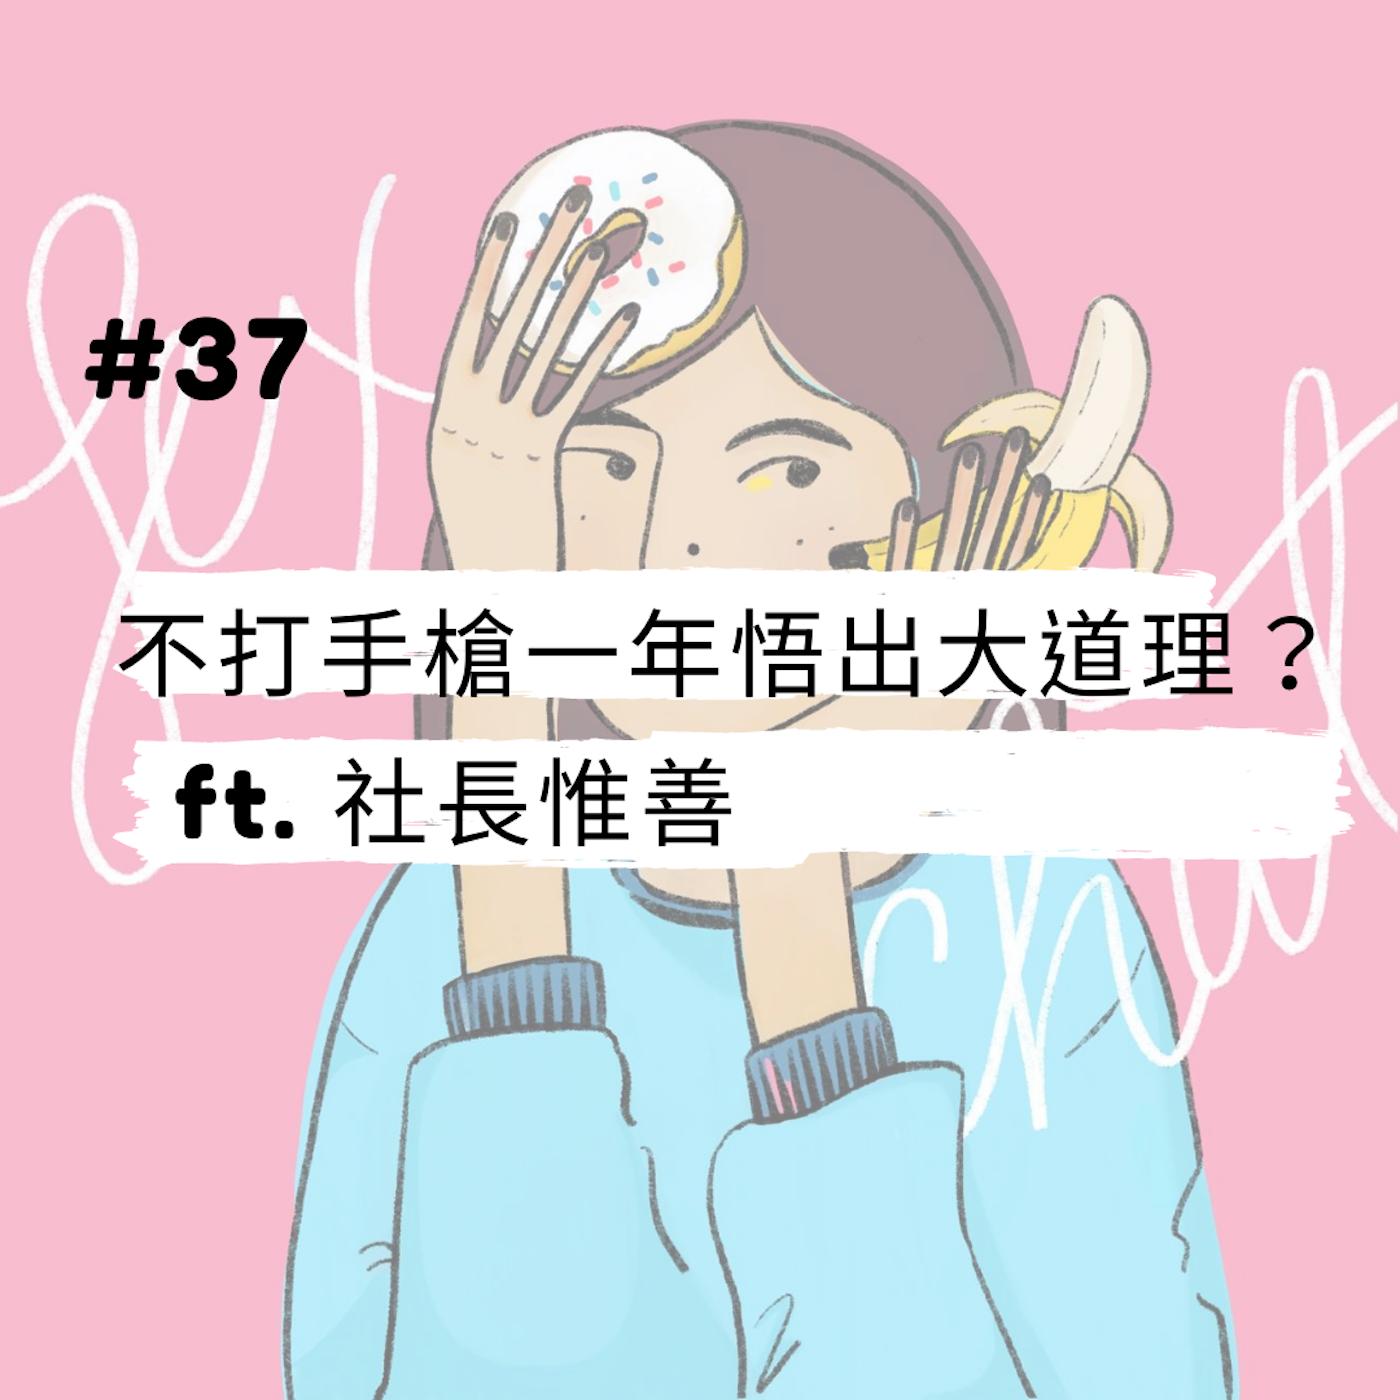 Sex Chat podcast #37 不打手槍一年悟出大道理? ft. 社長惟善